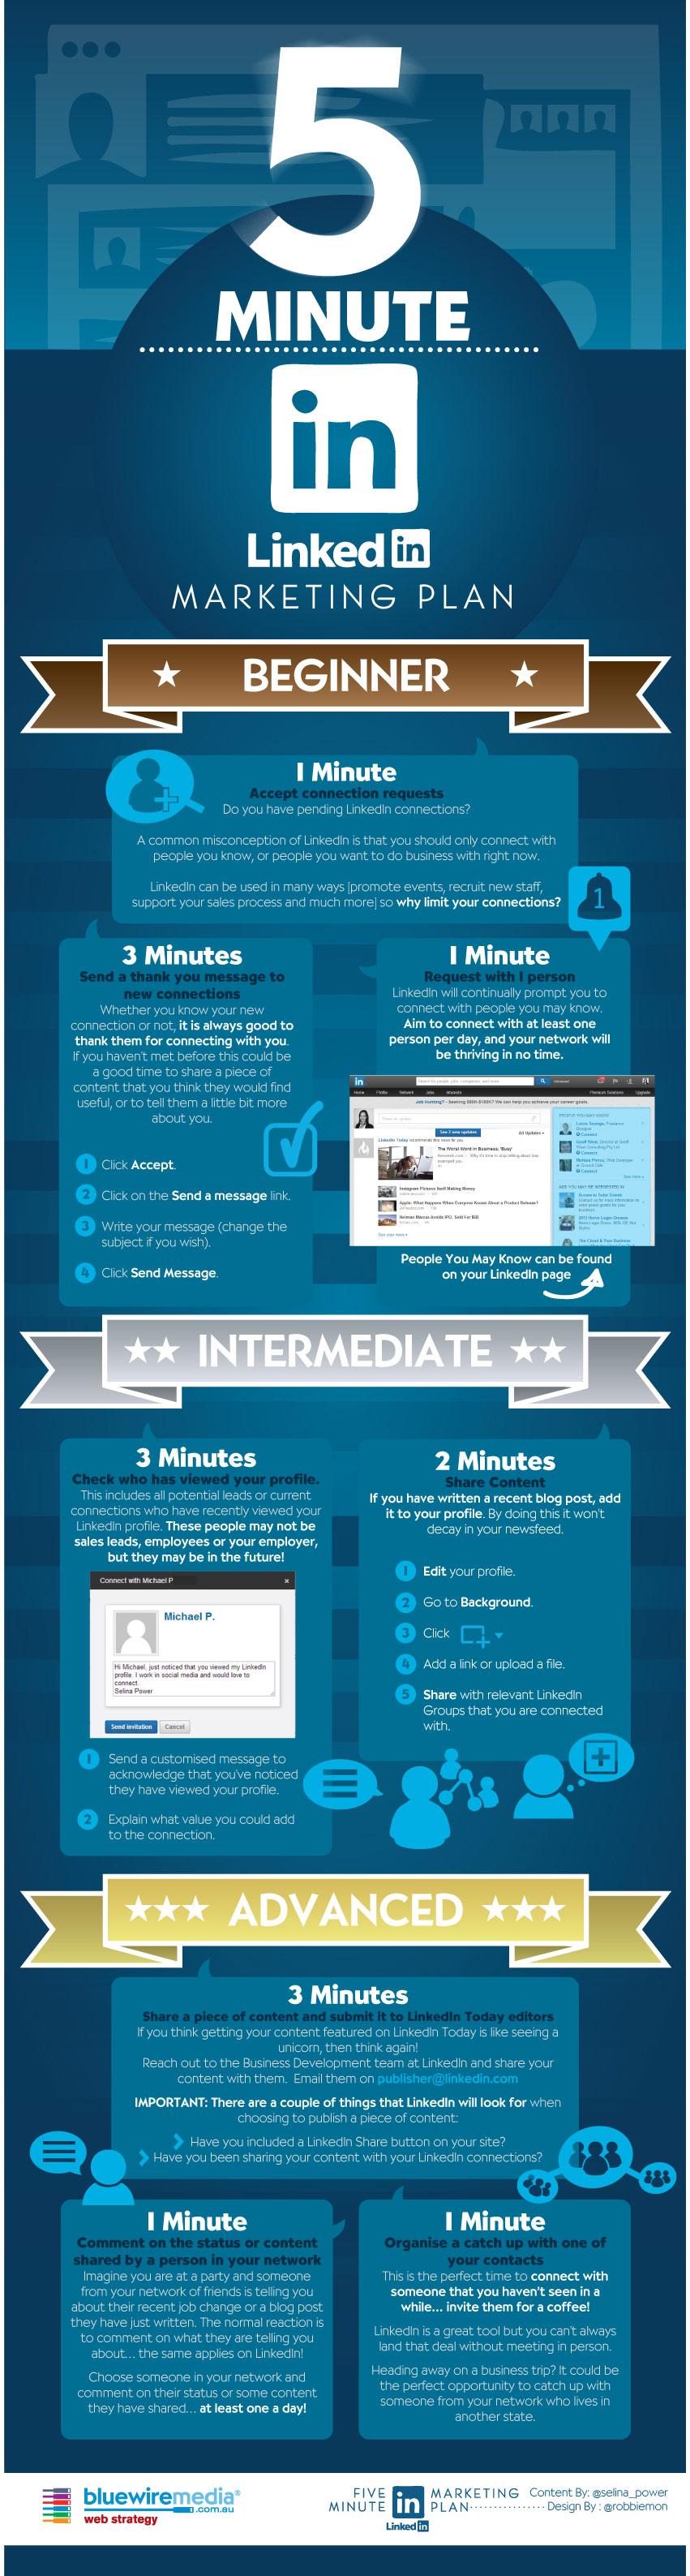 5 Minute LinkedIn Marketing Activities per Day